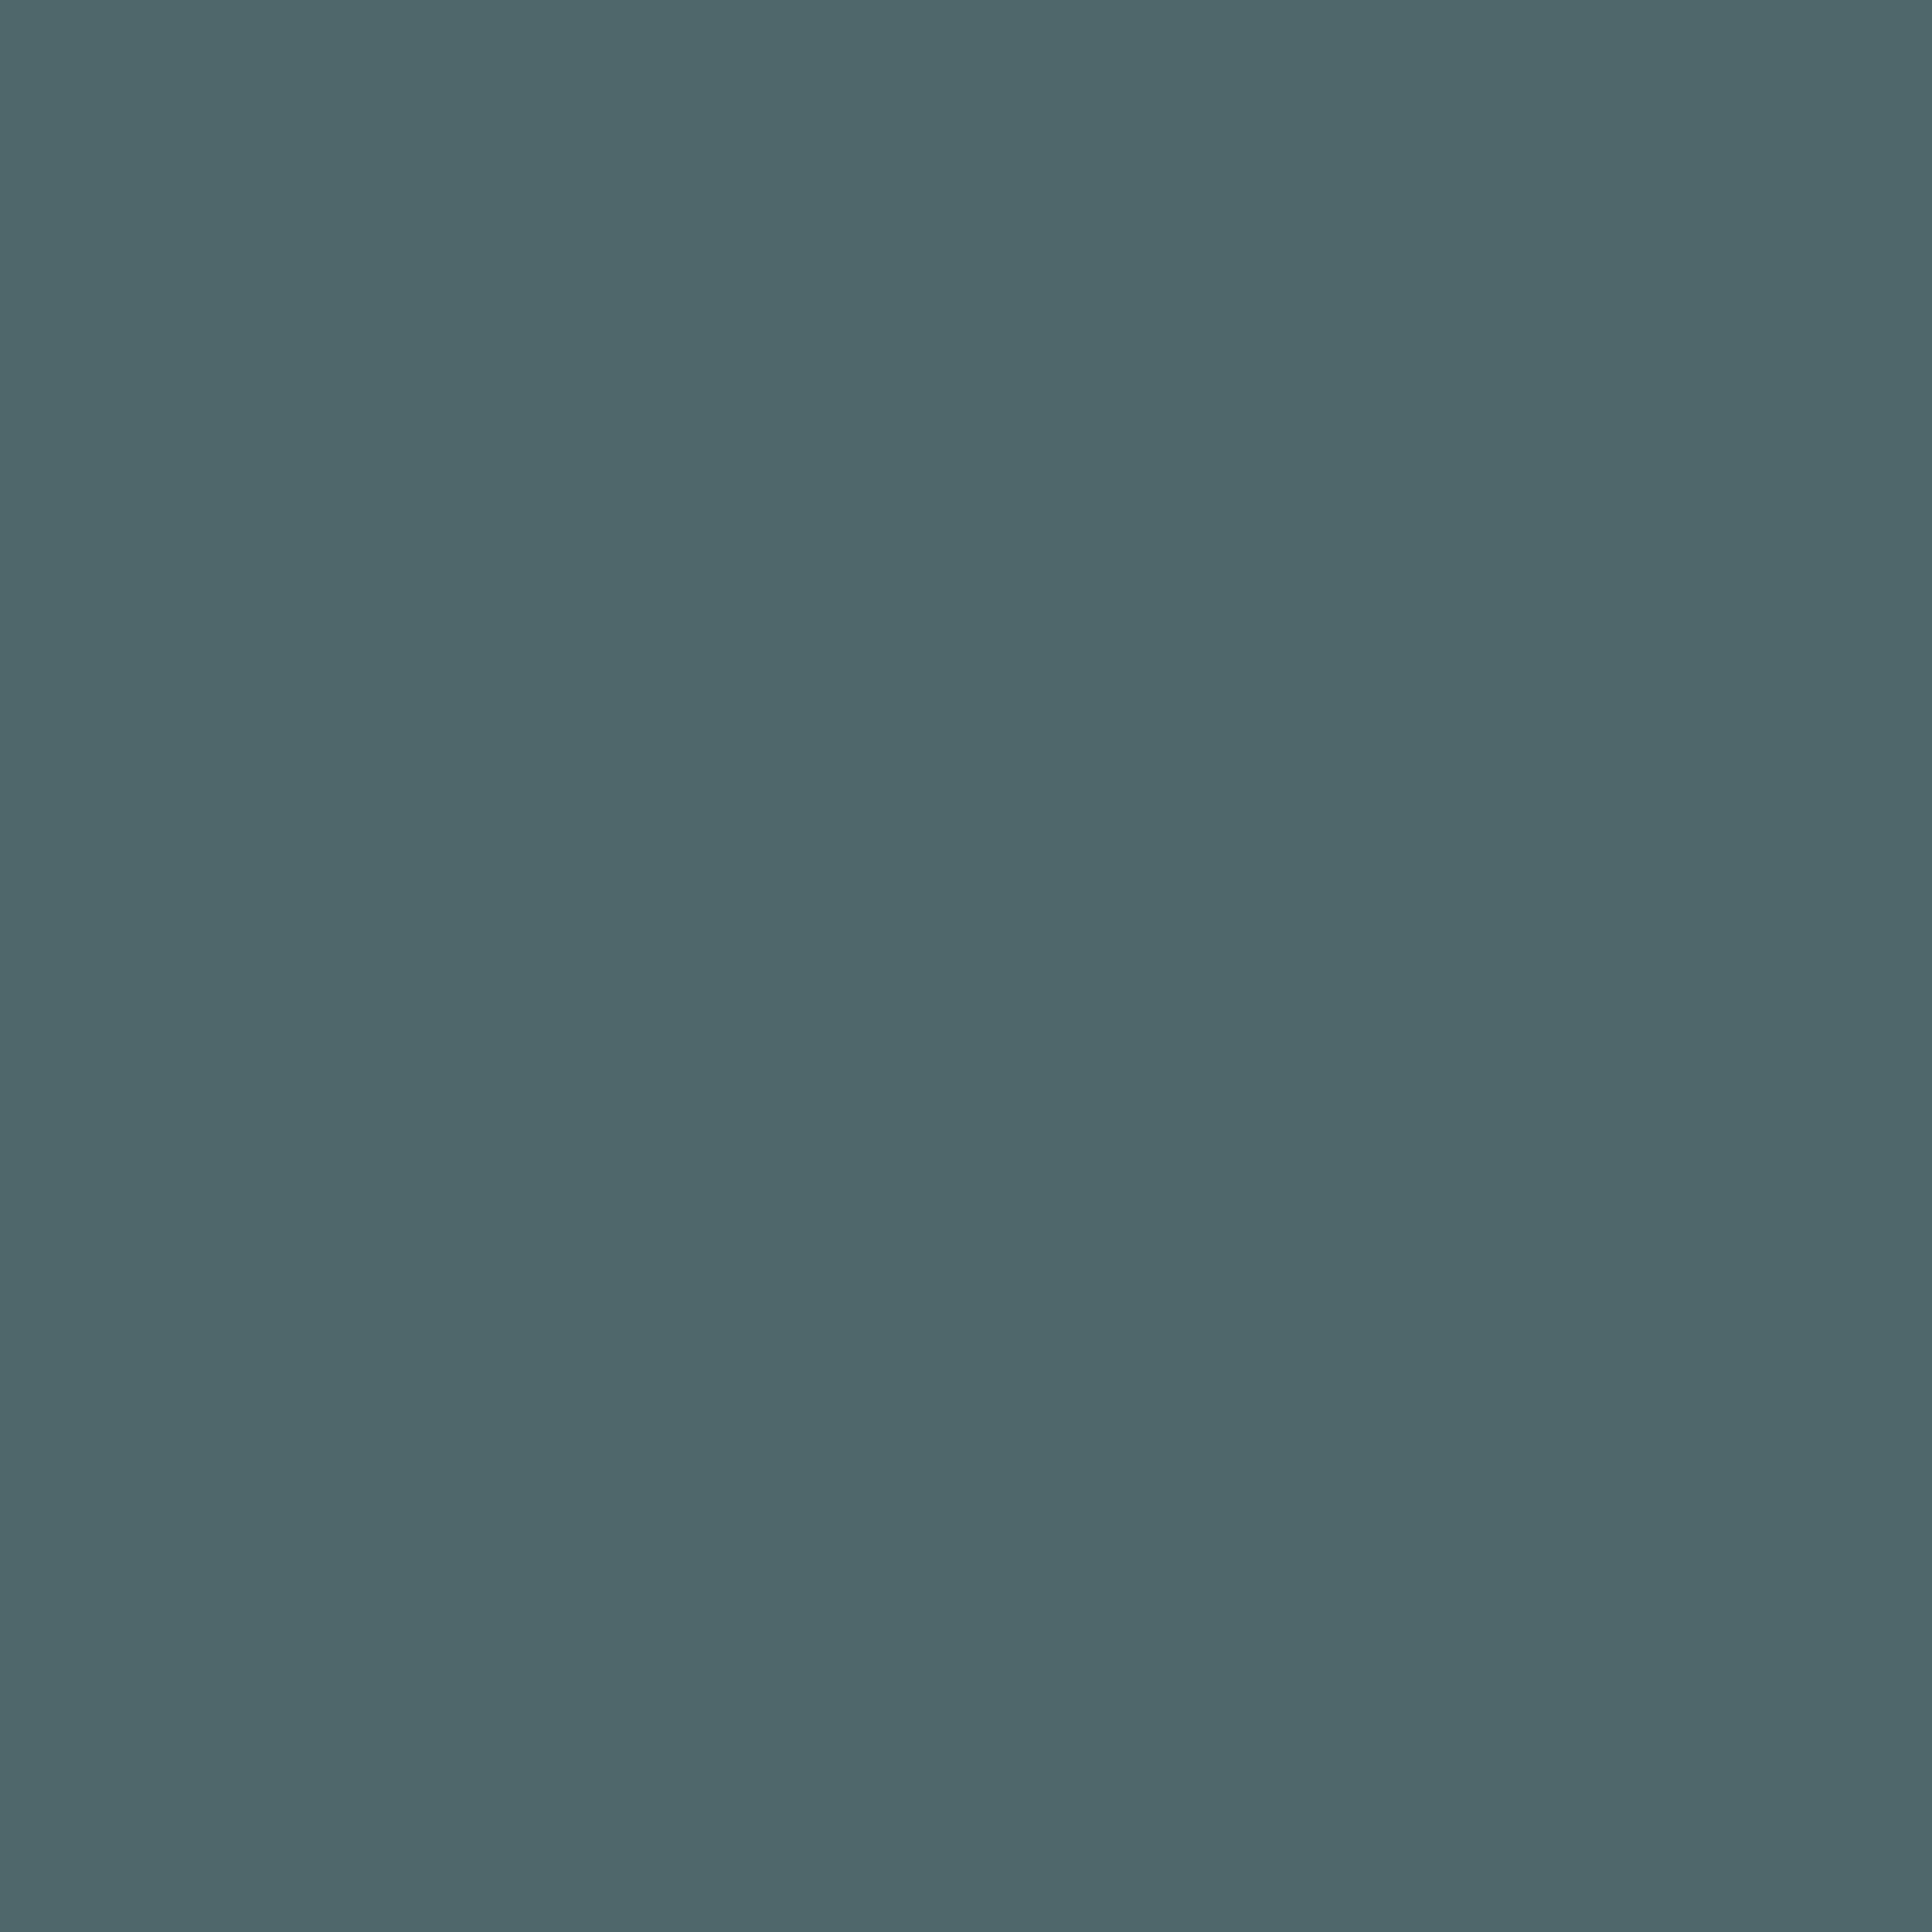 2048x2048 Stormcloud Solid Color Background